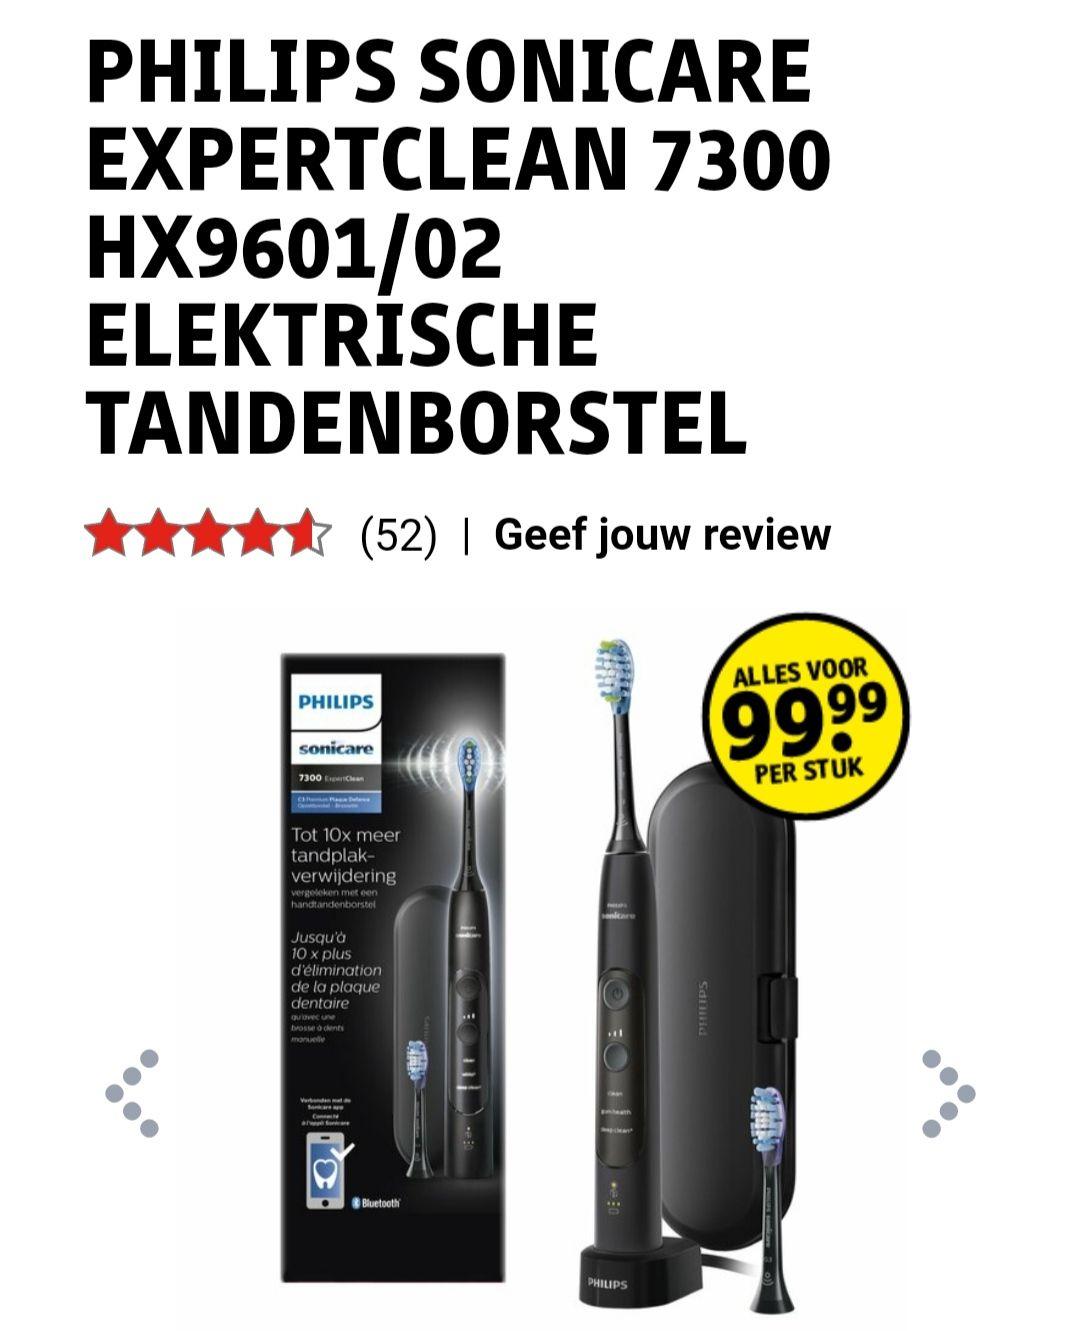 Philips Sonicare ExpertClean 7300 HX9601/02 Elektrische Tandenborstel